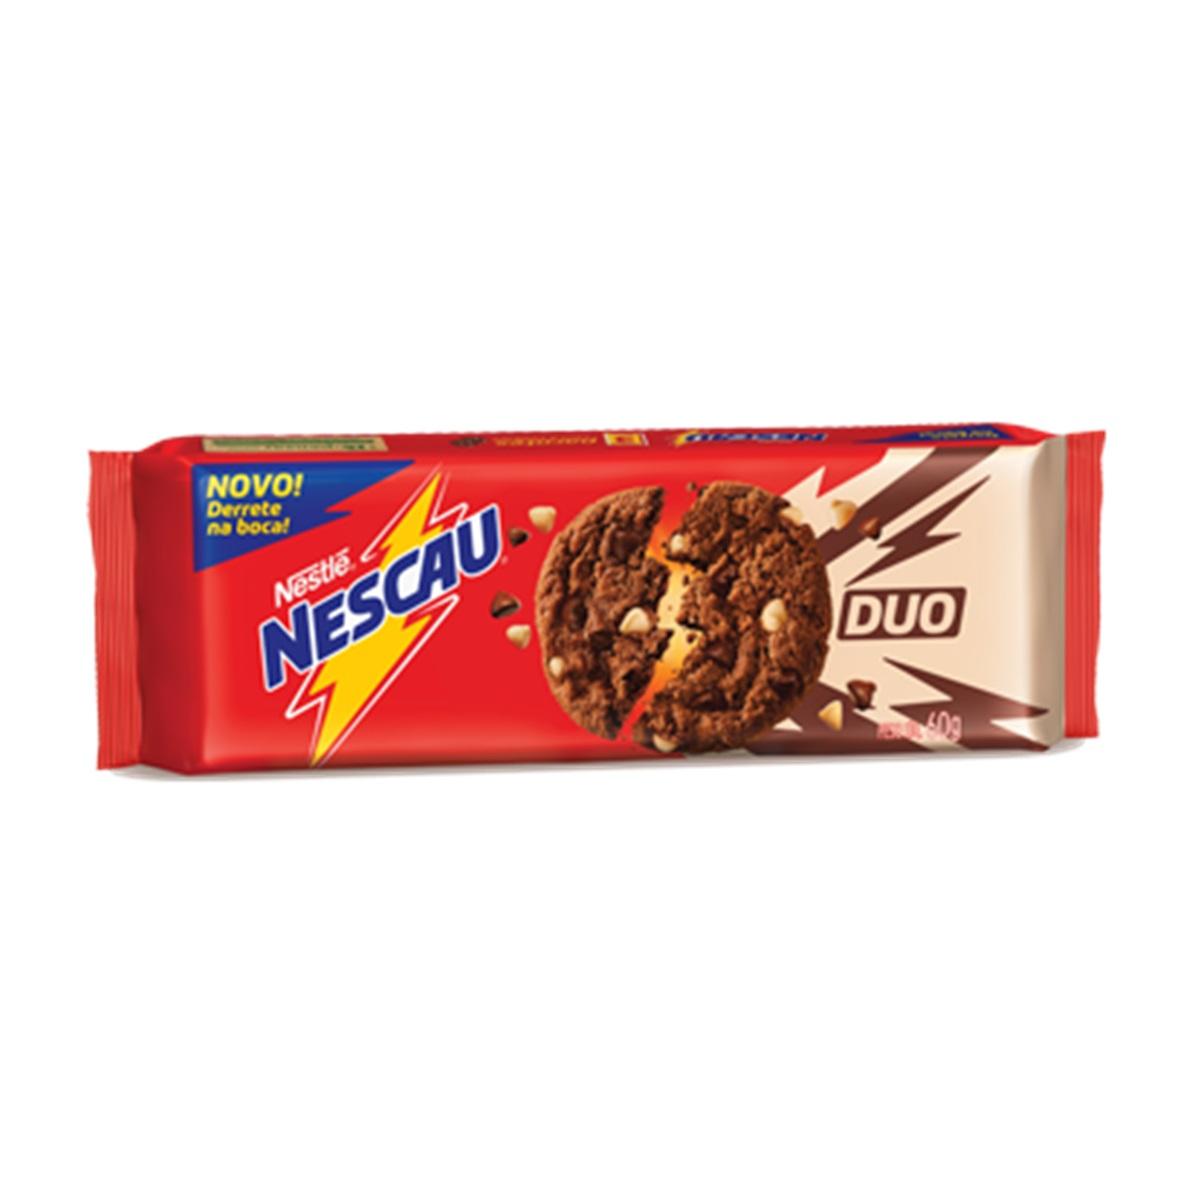 Cookie Chocolate Nescau Duo 60g - Nestlé